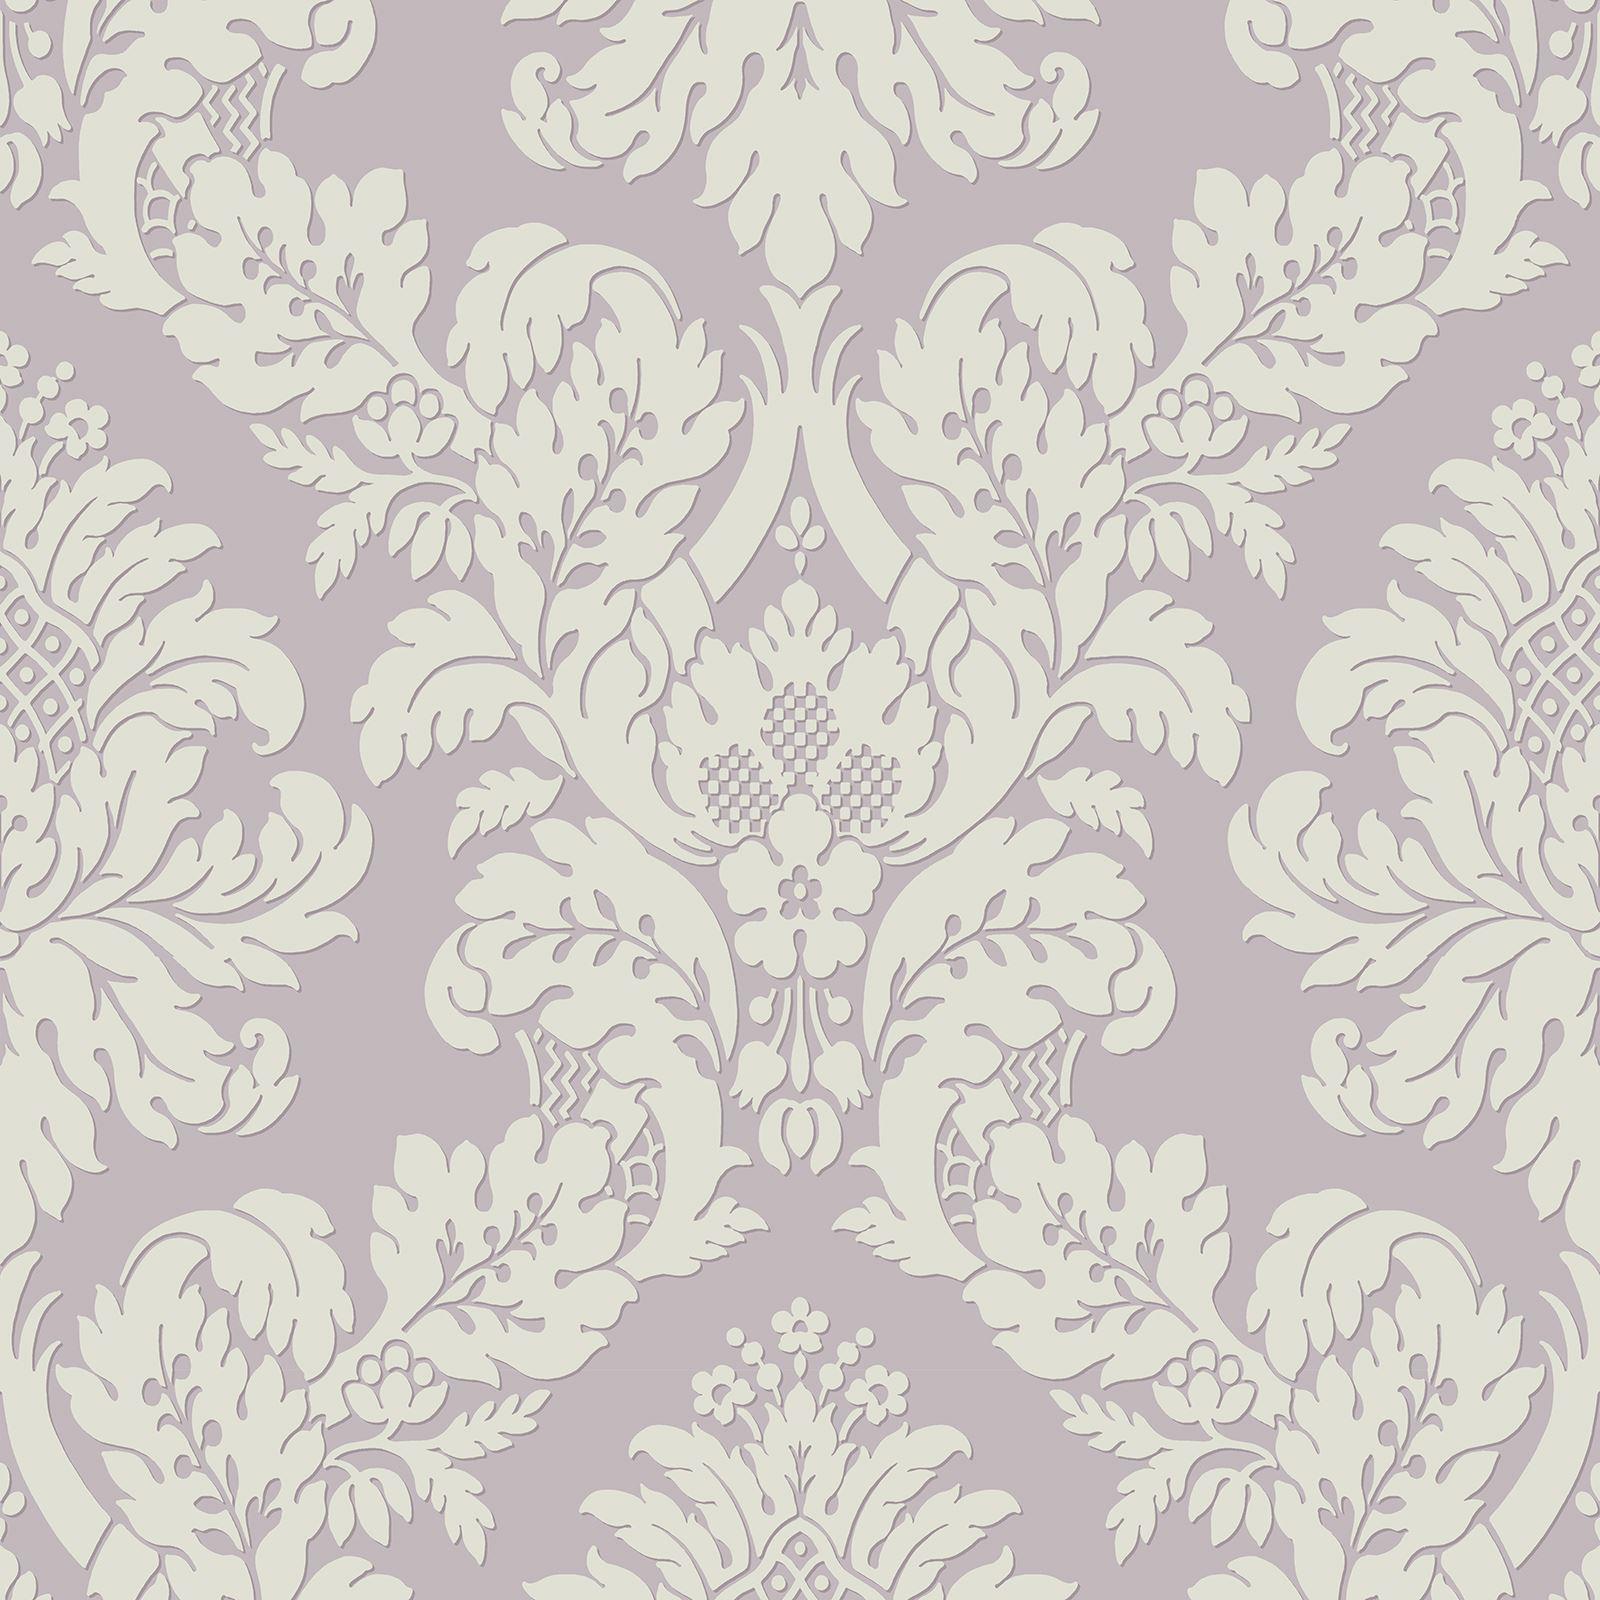 Fantastic Wallpaper High Quality Glitter - 7b64f714-060d-413d-8122-9013ec9ef0cc  Graphic_816561.jpg